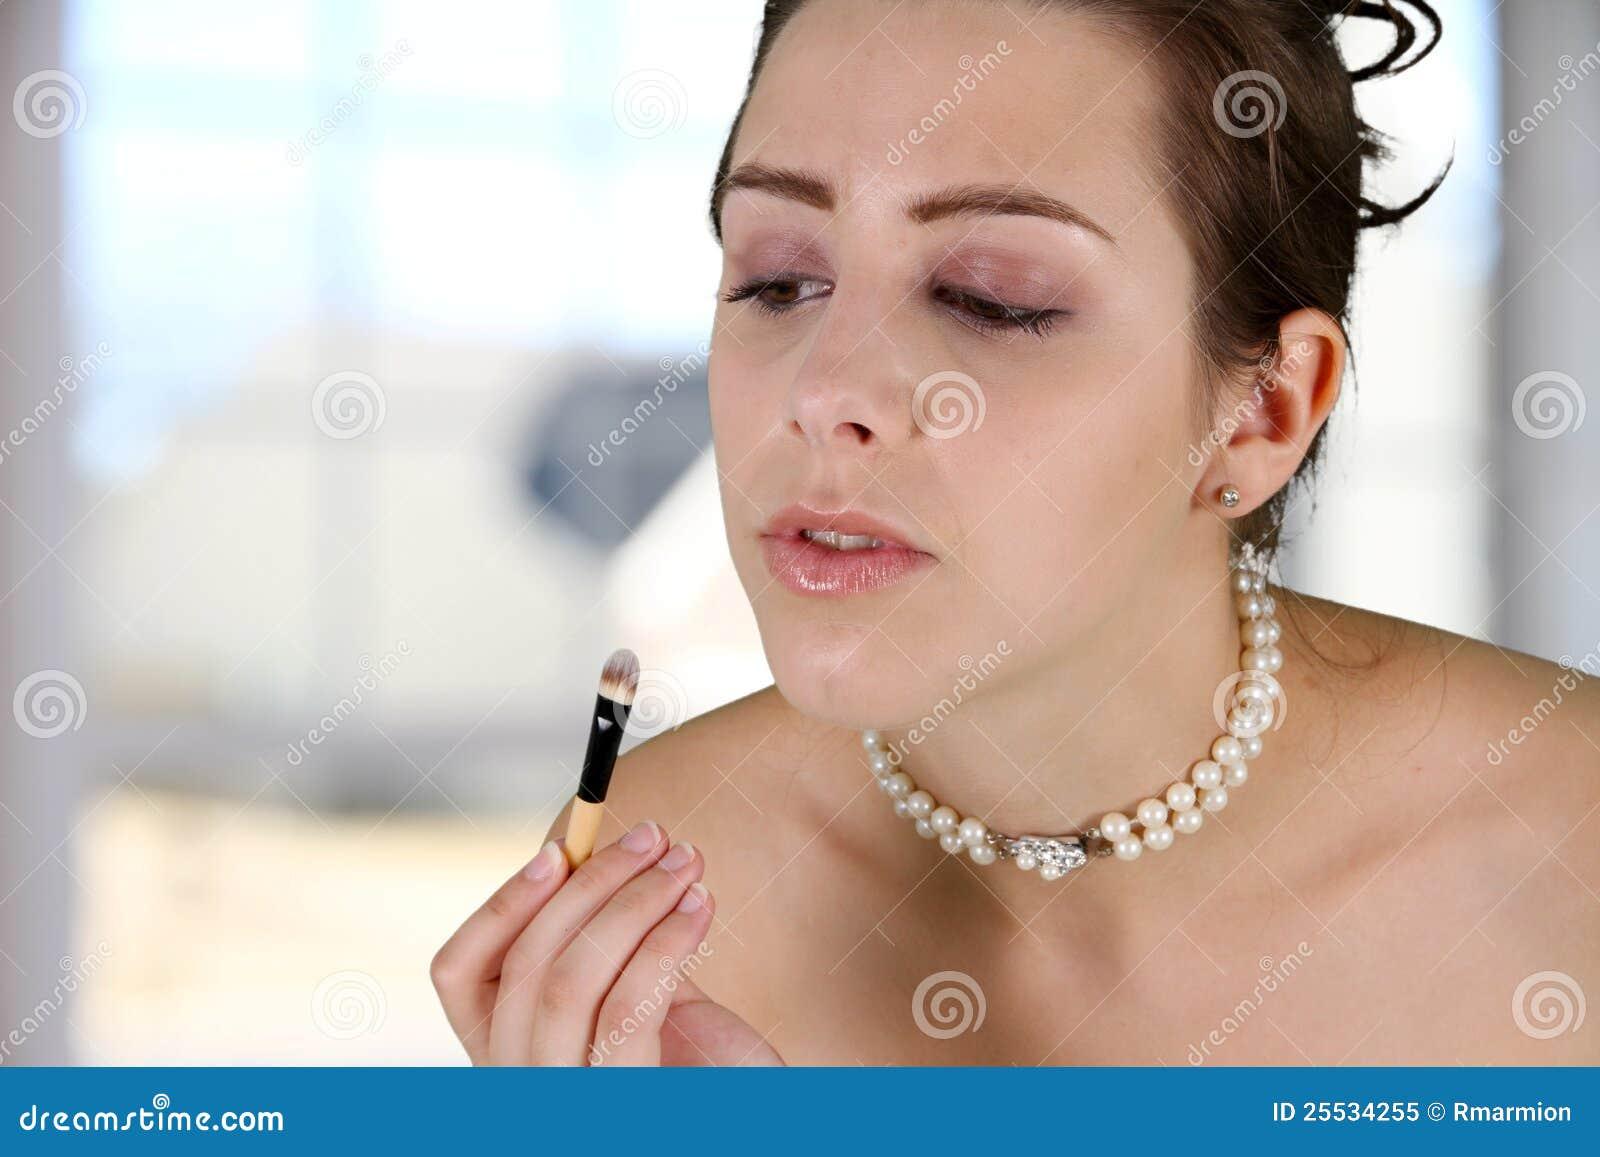 Gamlous ball gown strapless sweetheart beads working court train beach wedding yellow dress